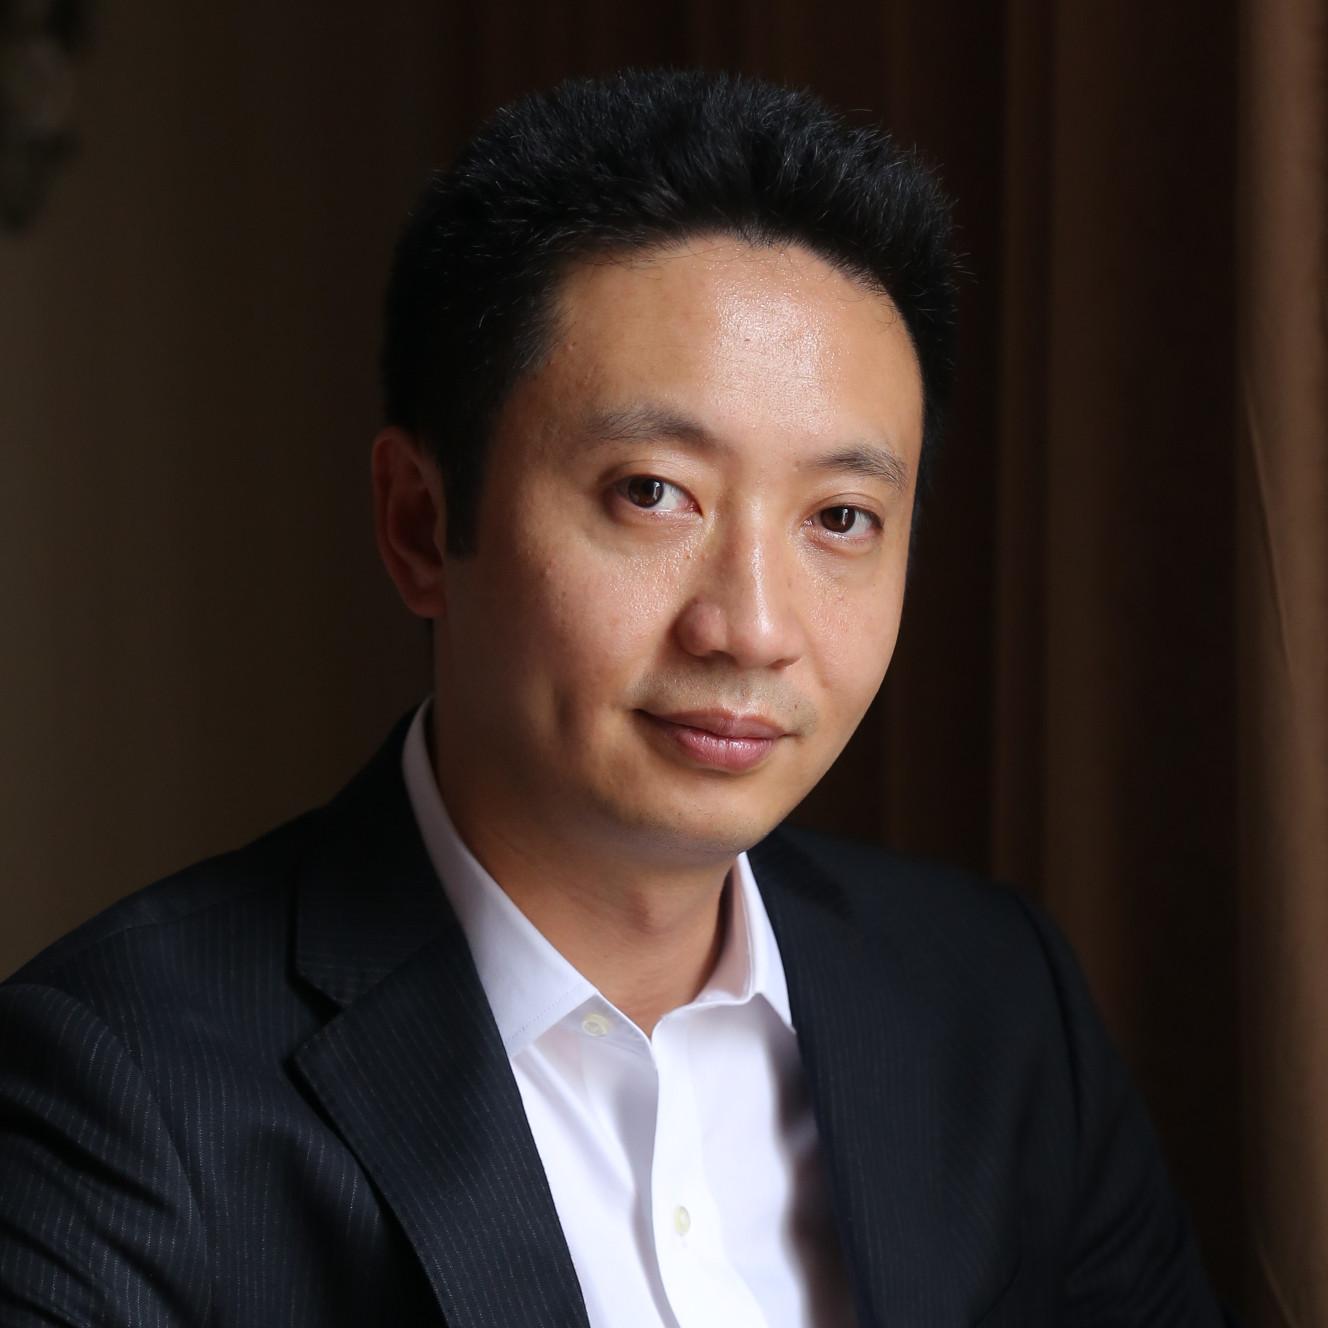 Ziran Zhang